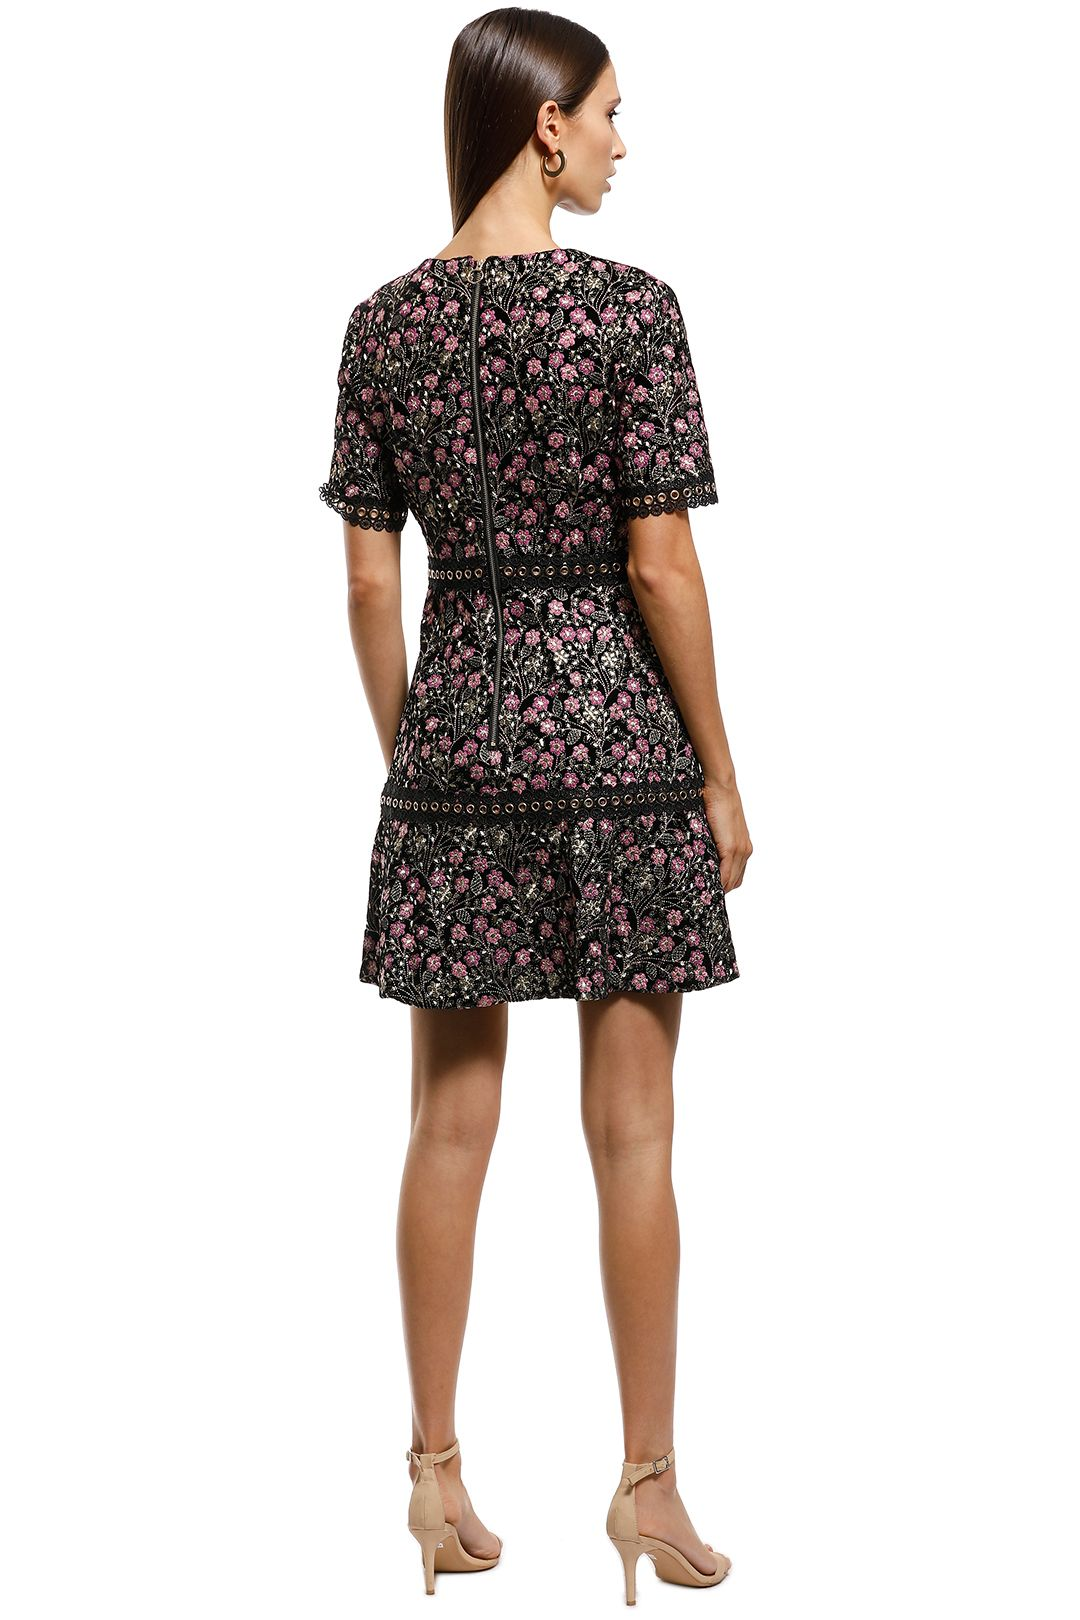 Elliatt - Icon Dress - Floral - Back